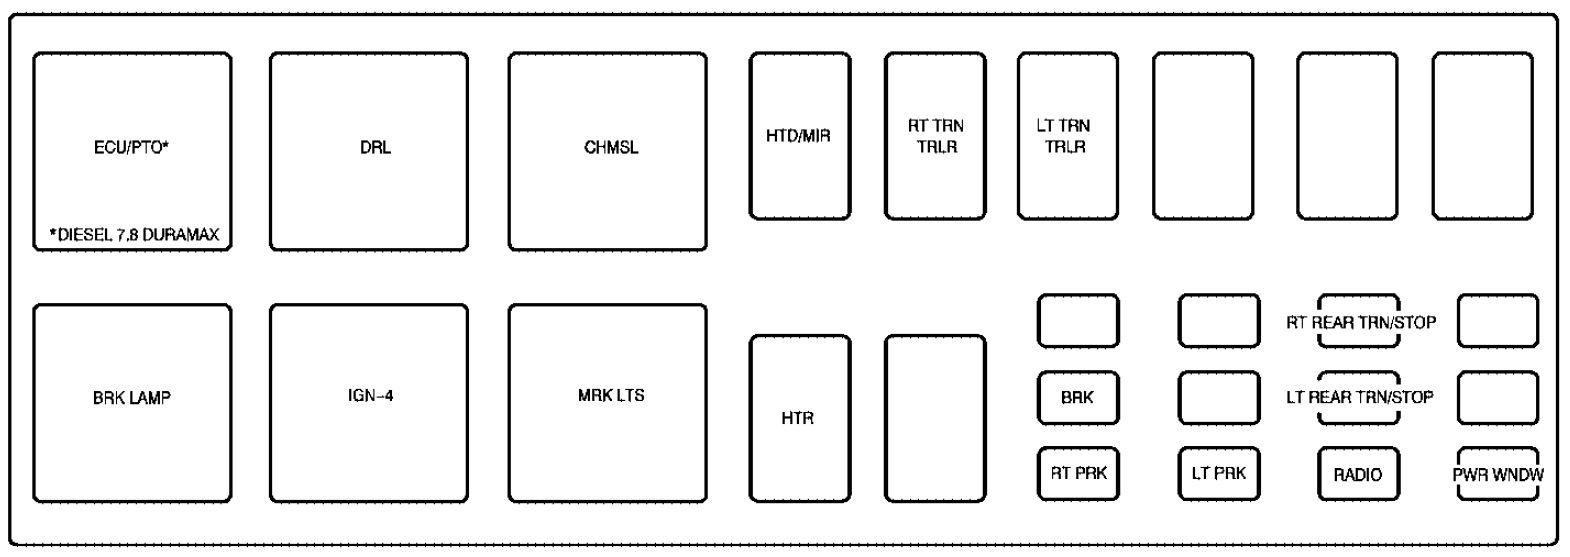 2005 Gmc C7500 Fuse Box Diagram : 2005 gmc c4500 wiring diagram ~ A.2002-acura-tl-radio.info Haus und Dekorationen